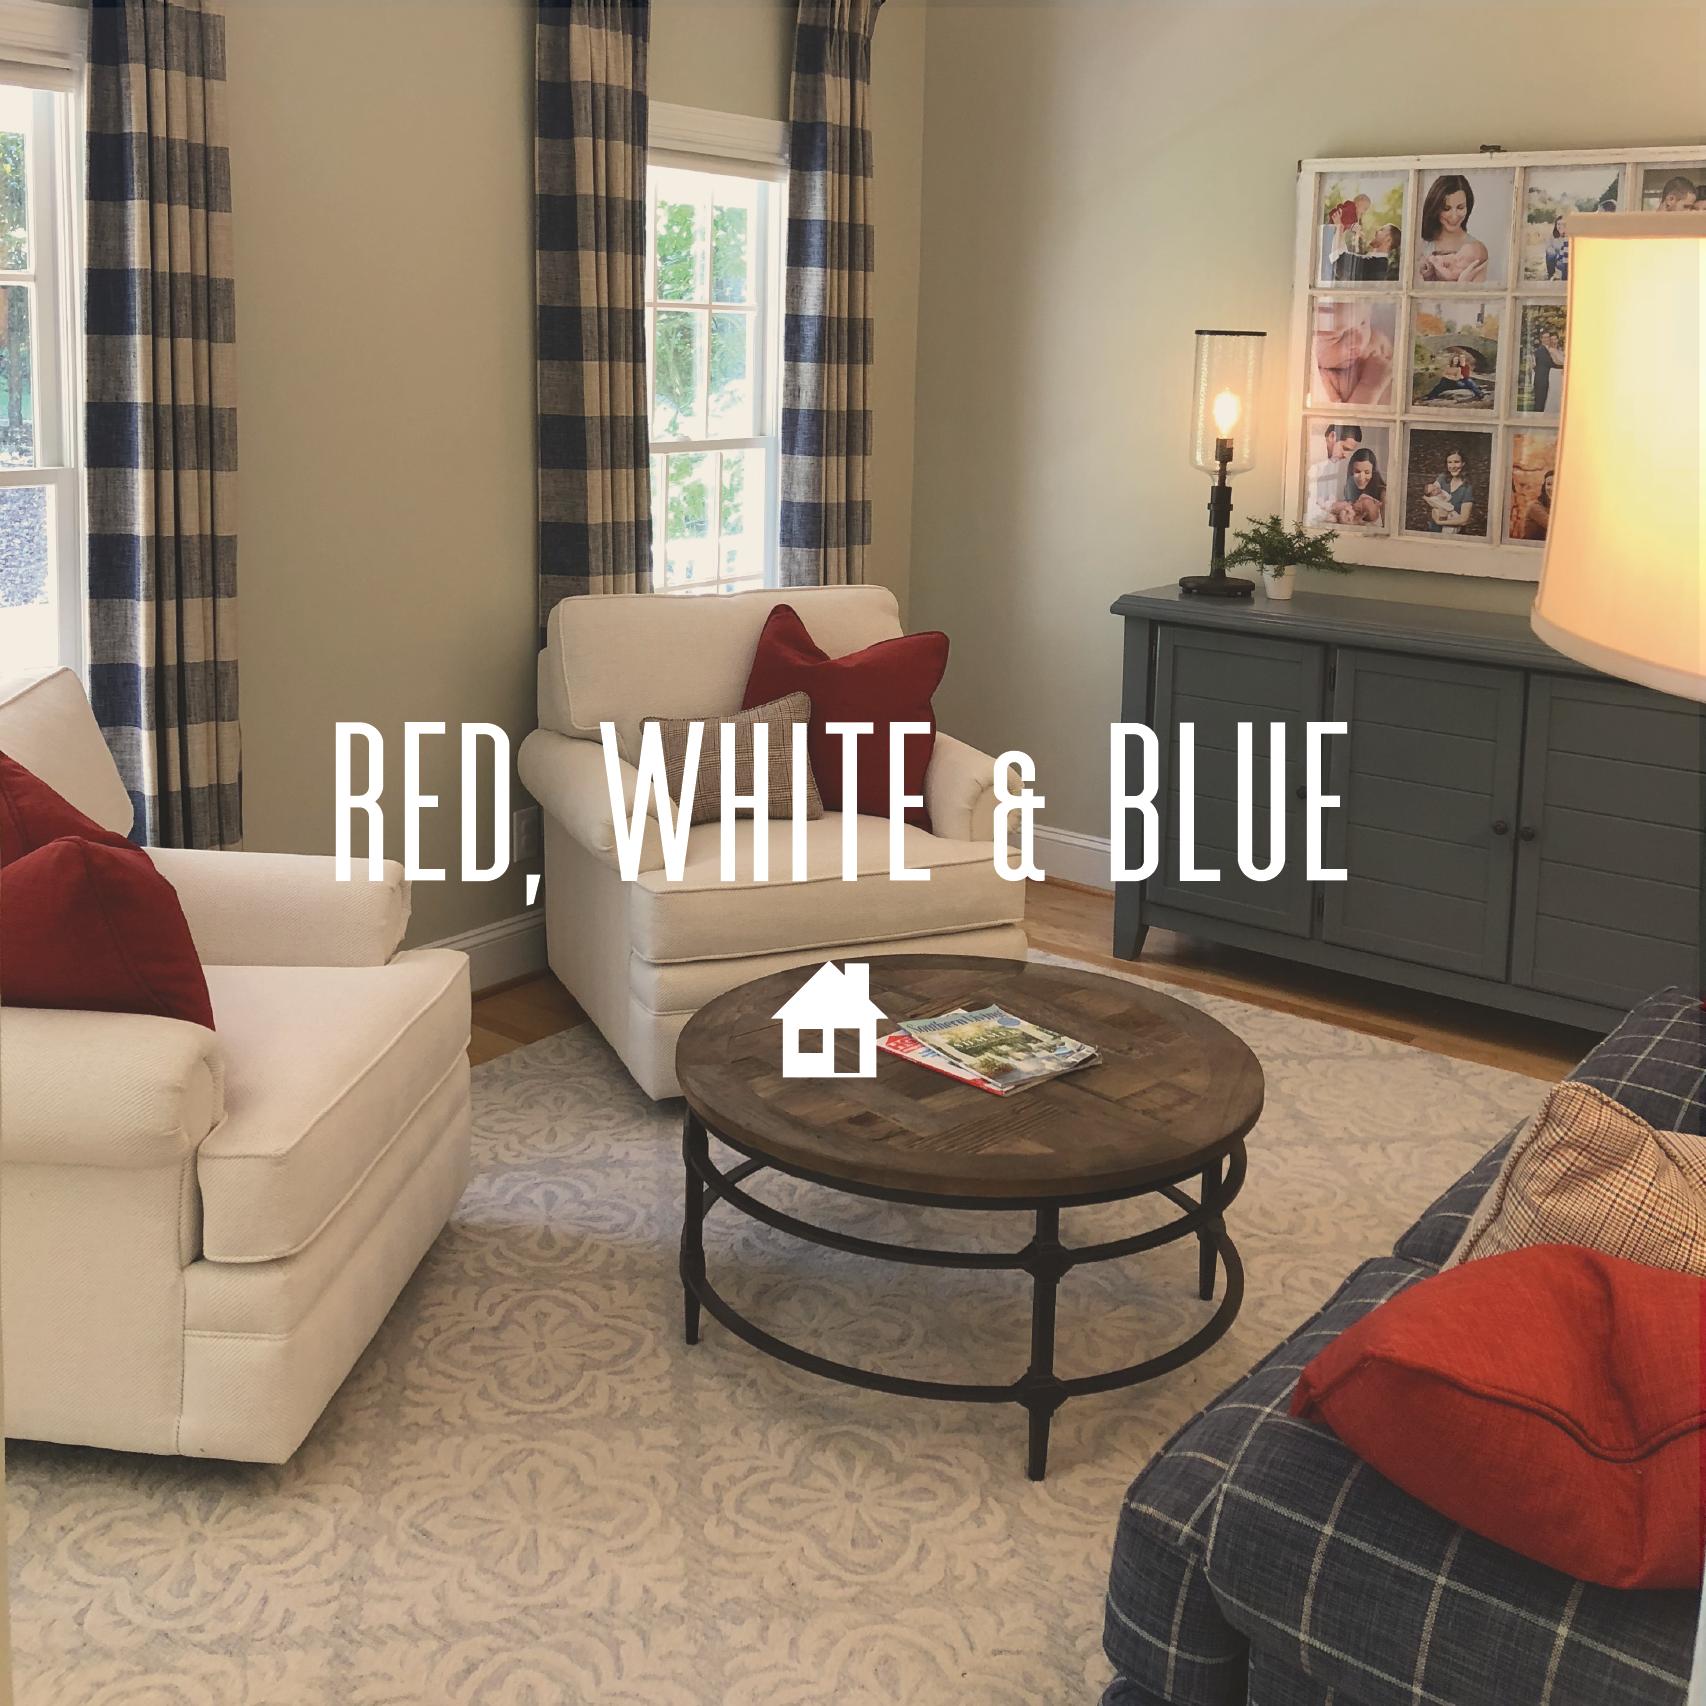 red-white-blue-family-room-chapel-hill-nc.jpg